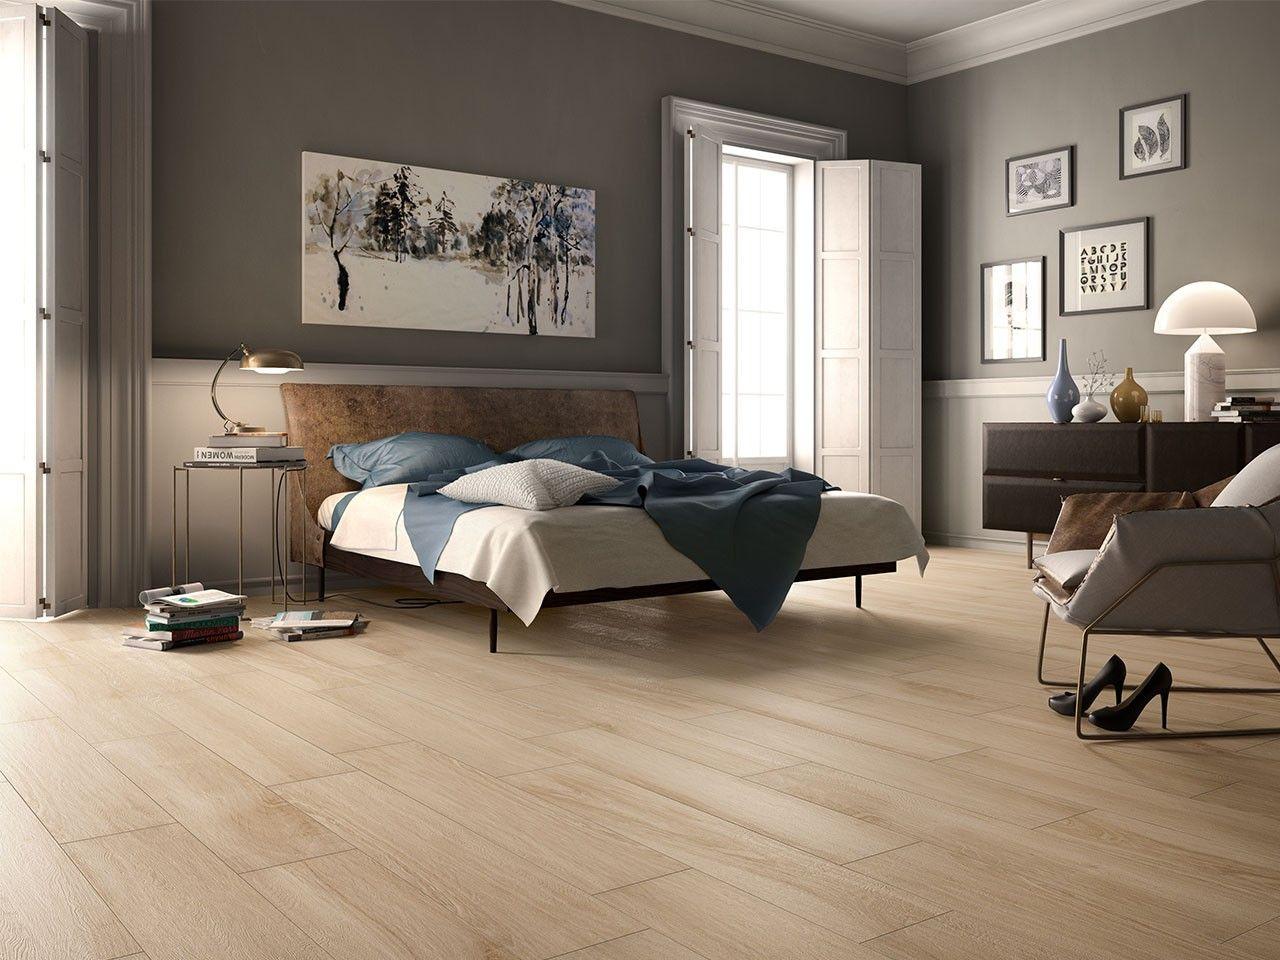 Lea Ceramiche Bioessenze Prezzi.Maine Betulla 20x120 Iperceramica European Room Design